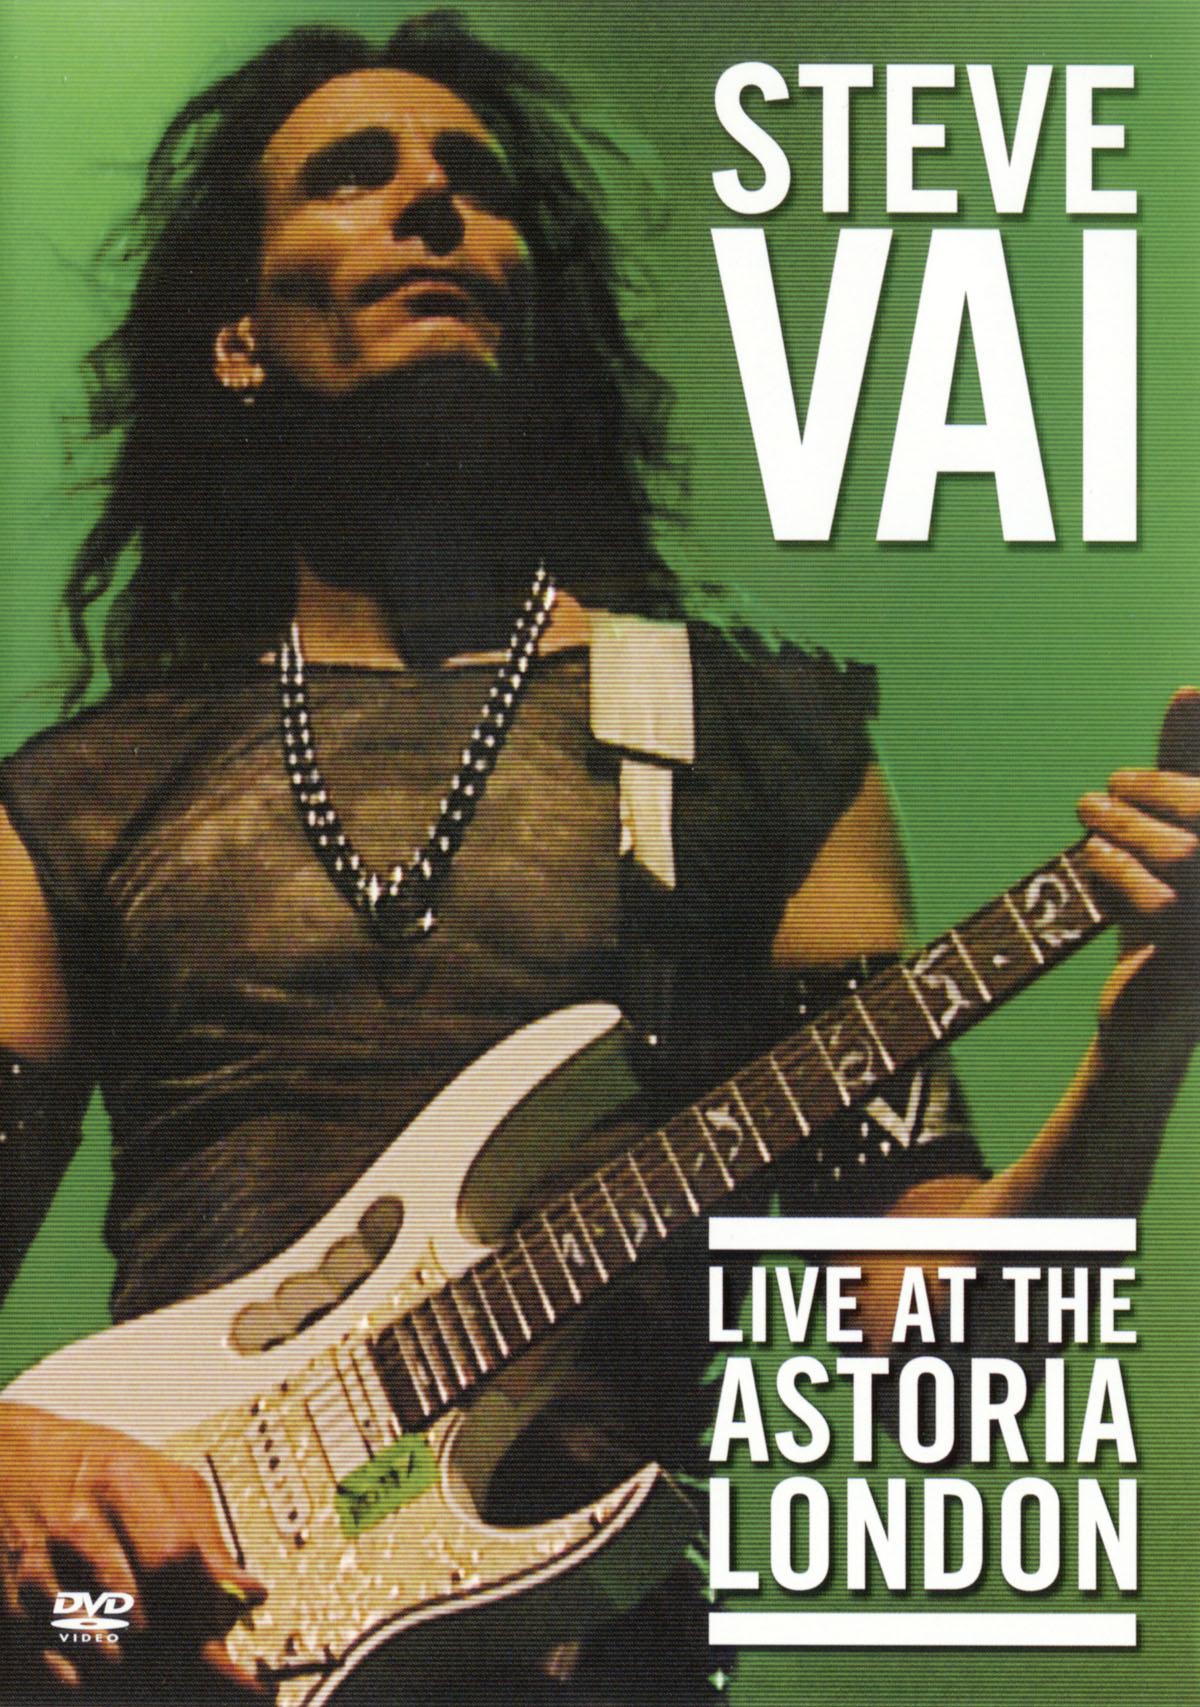 Steve Vai: Steve Vai - Live at the Astoria London: Guitar Solo: Recorded